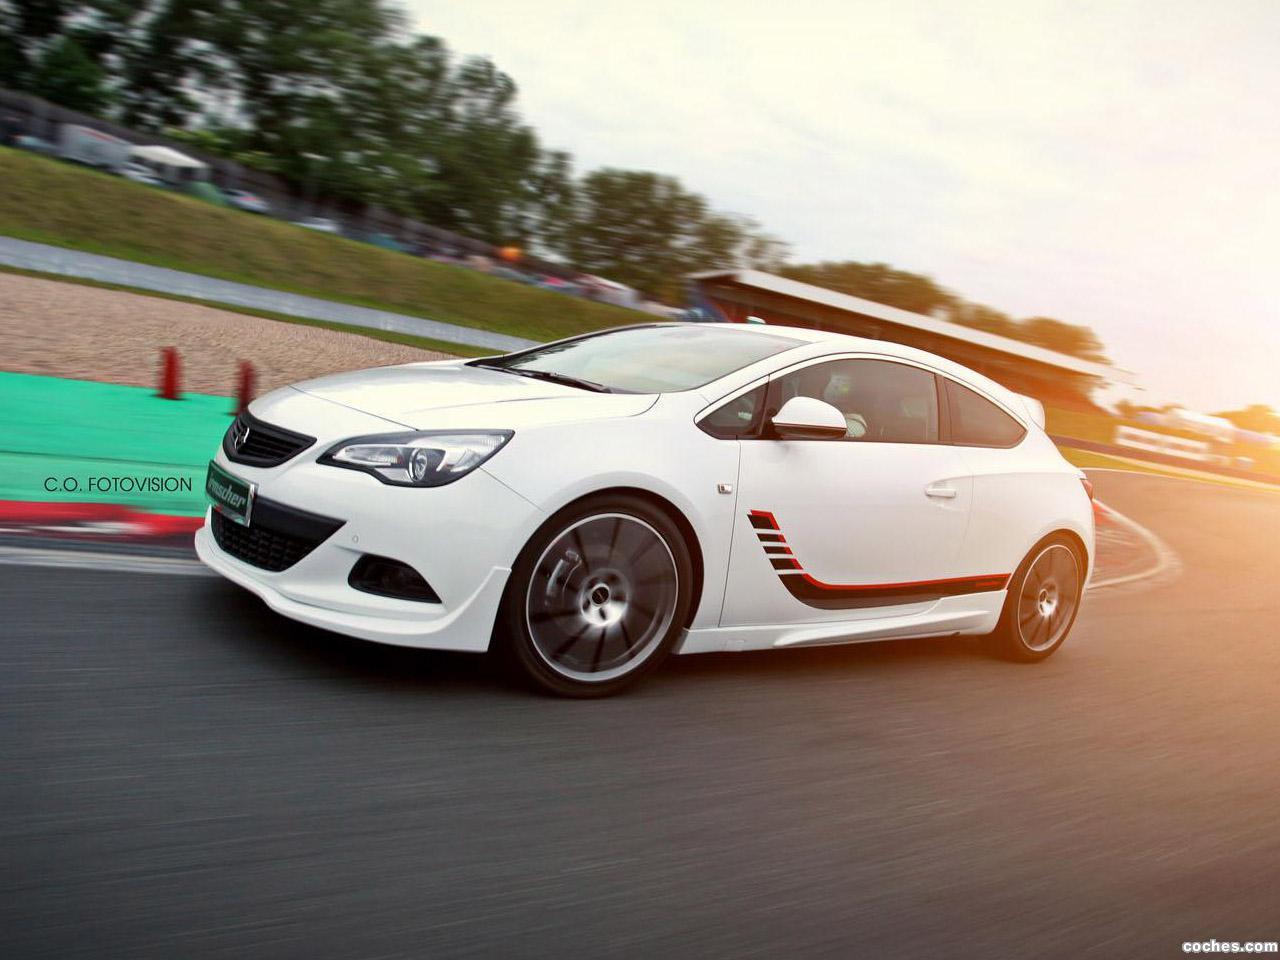 Foto 0 de Irmscher Opel Astra GTC Turbo I 1400 2014